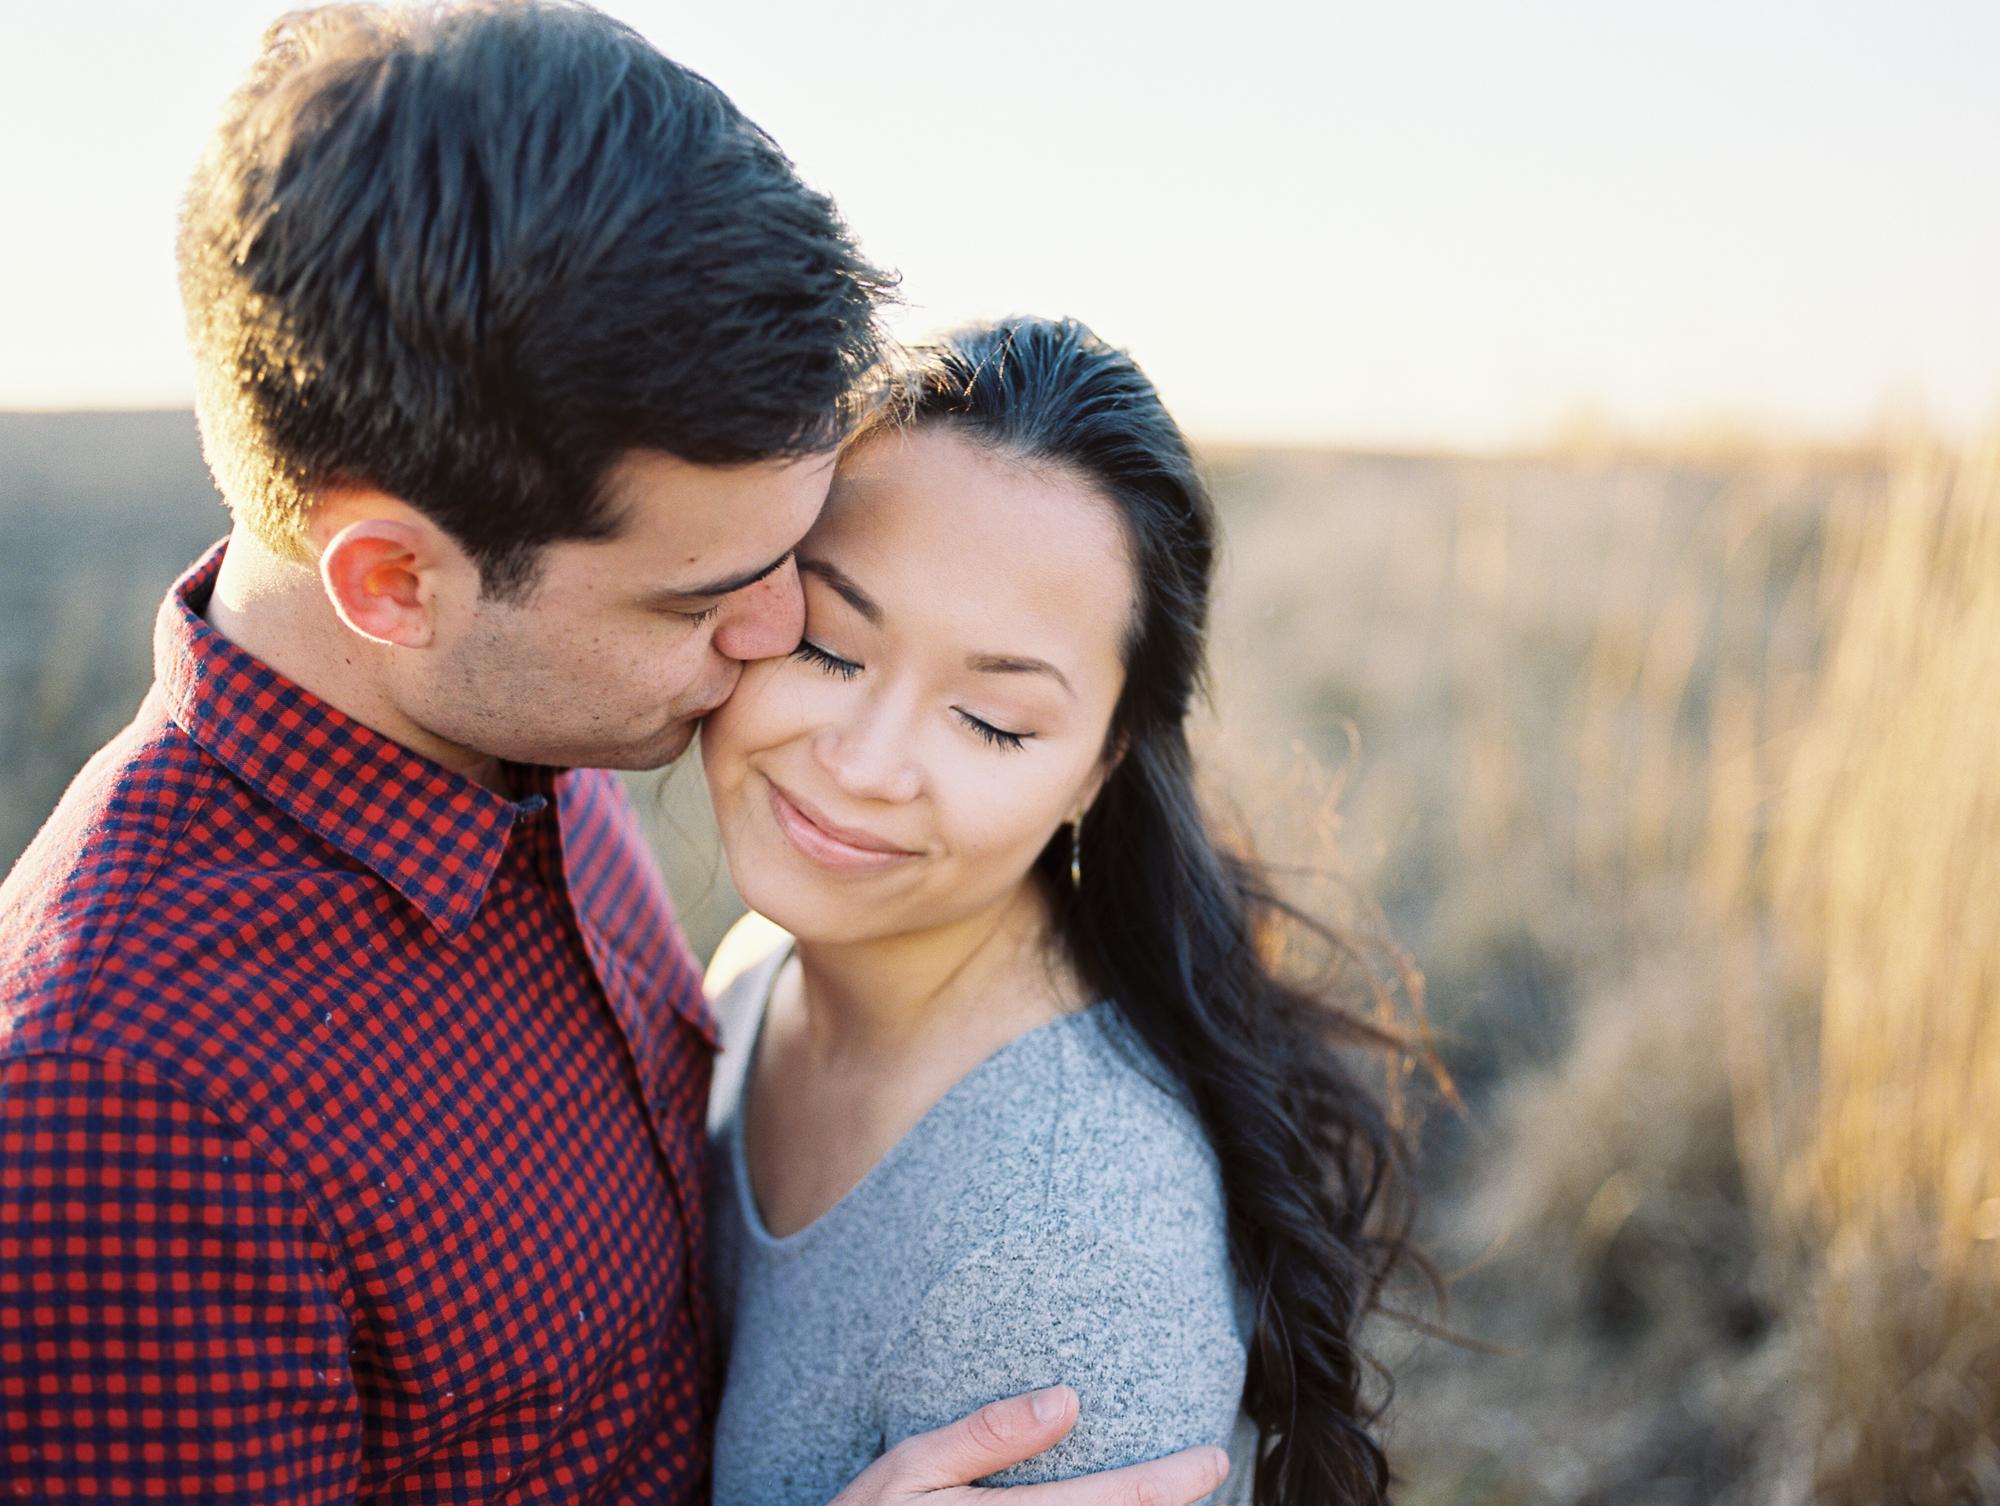 Megan and Blake - Memphis Engagement Photos - © Kaitlyn Stoddard Photography-5.jpg